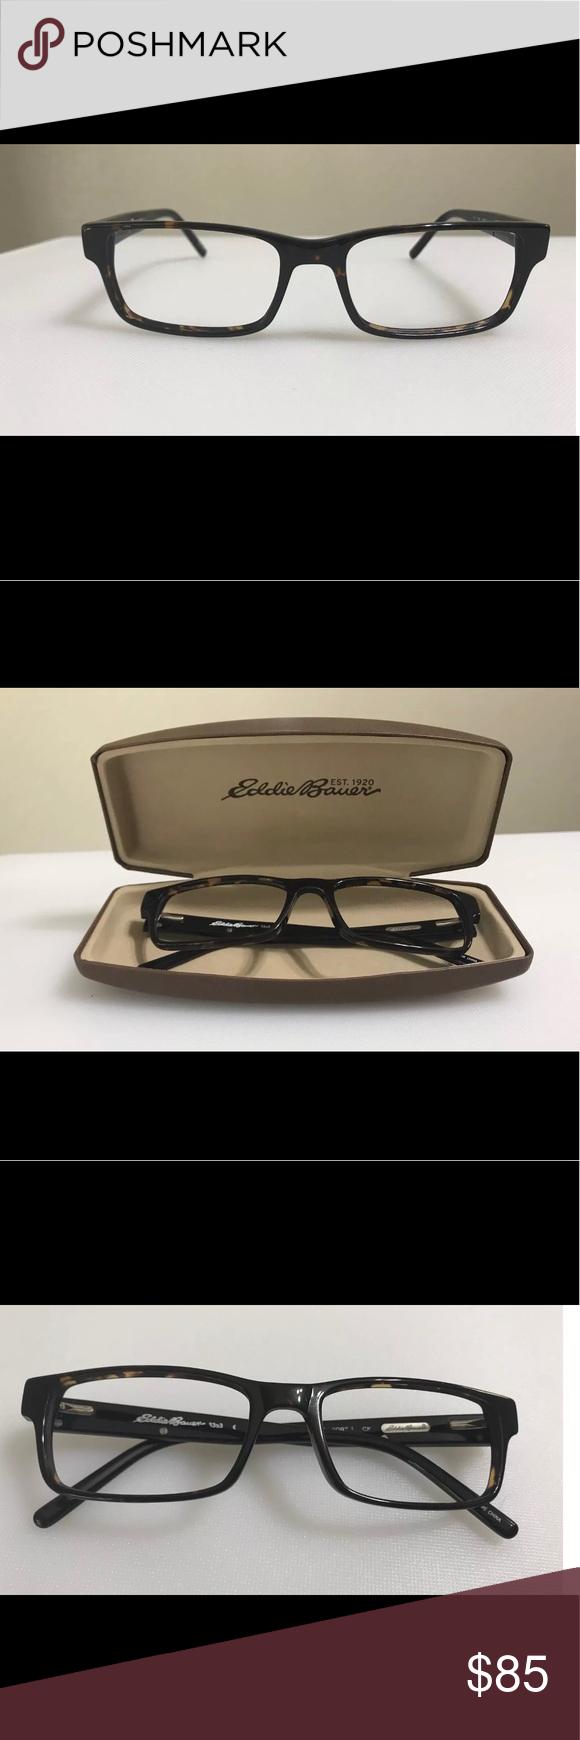 9e00db26549e Eddie Bauer 8353 Eyeglass Frame with hard case Very gently used Eddie Bauer  Eyeglass Frames Model   8353 Specifications- Gender  Mens